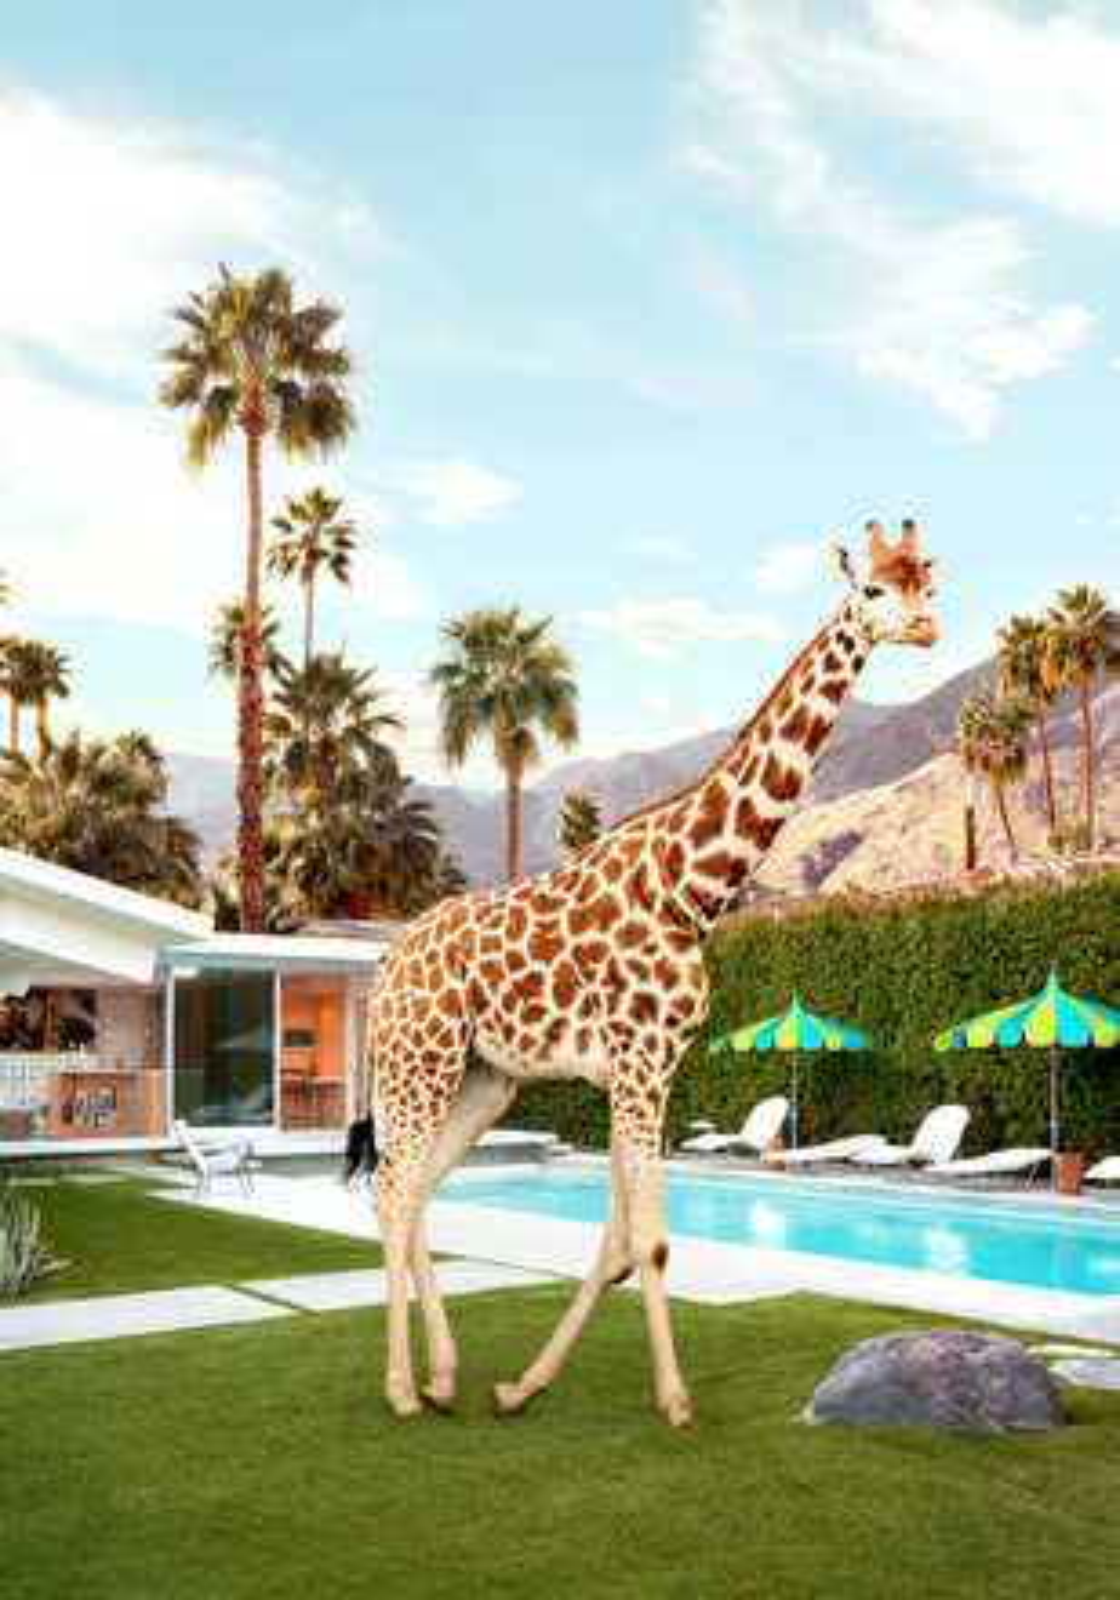 Pool Side Giraffe - Paul Fuentes